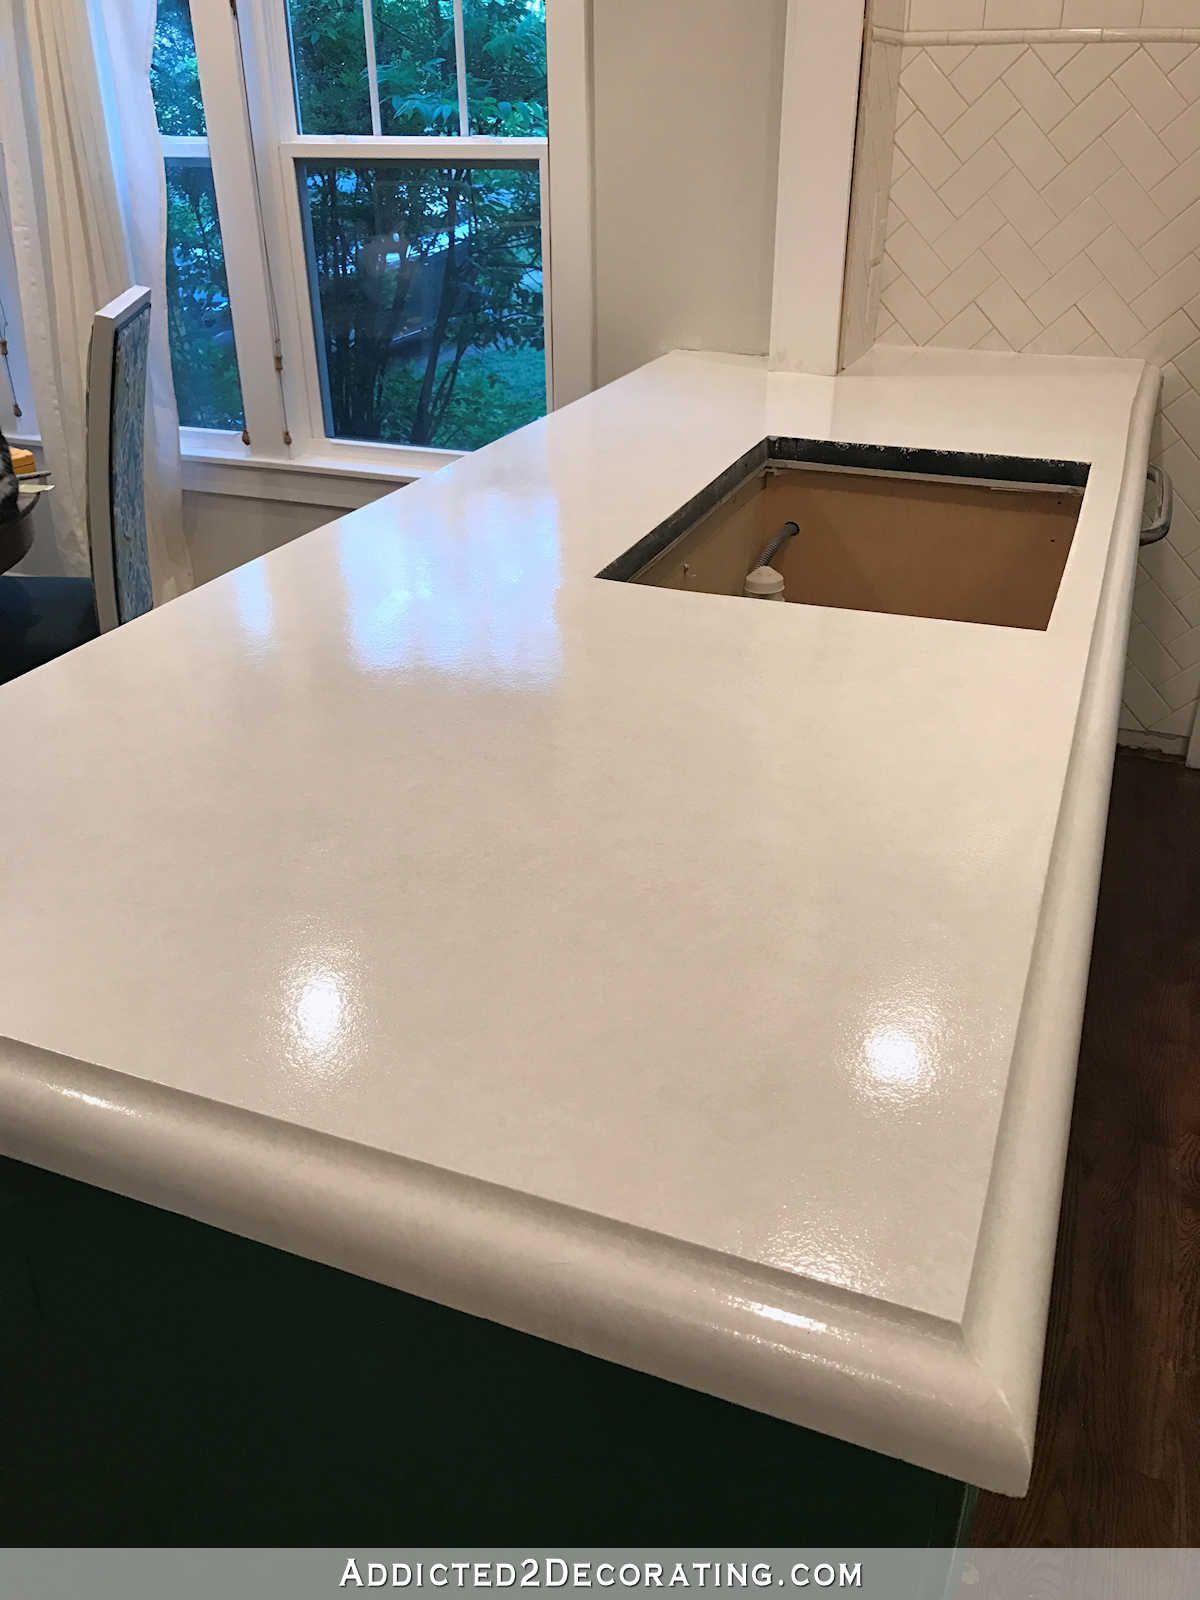 Refinishing Concrete Countertops Part 3 Of 3 Addicted 2 Decorating Concrete Countertops Countertops Cement Countertops